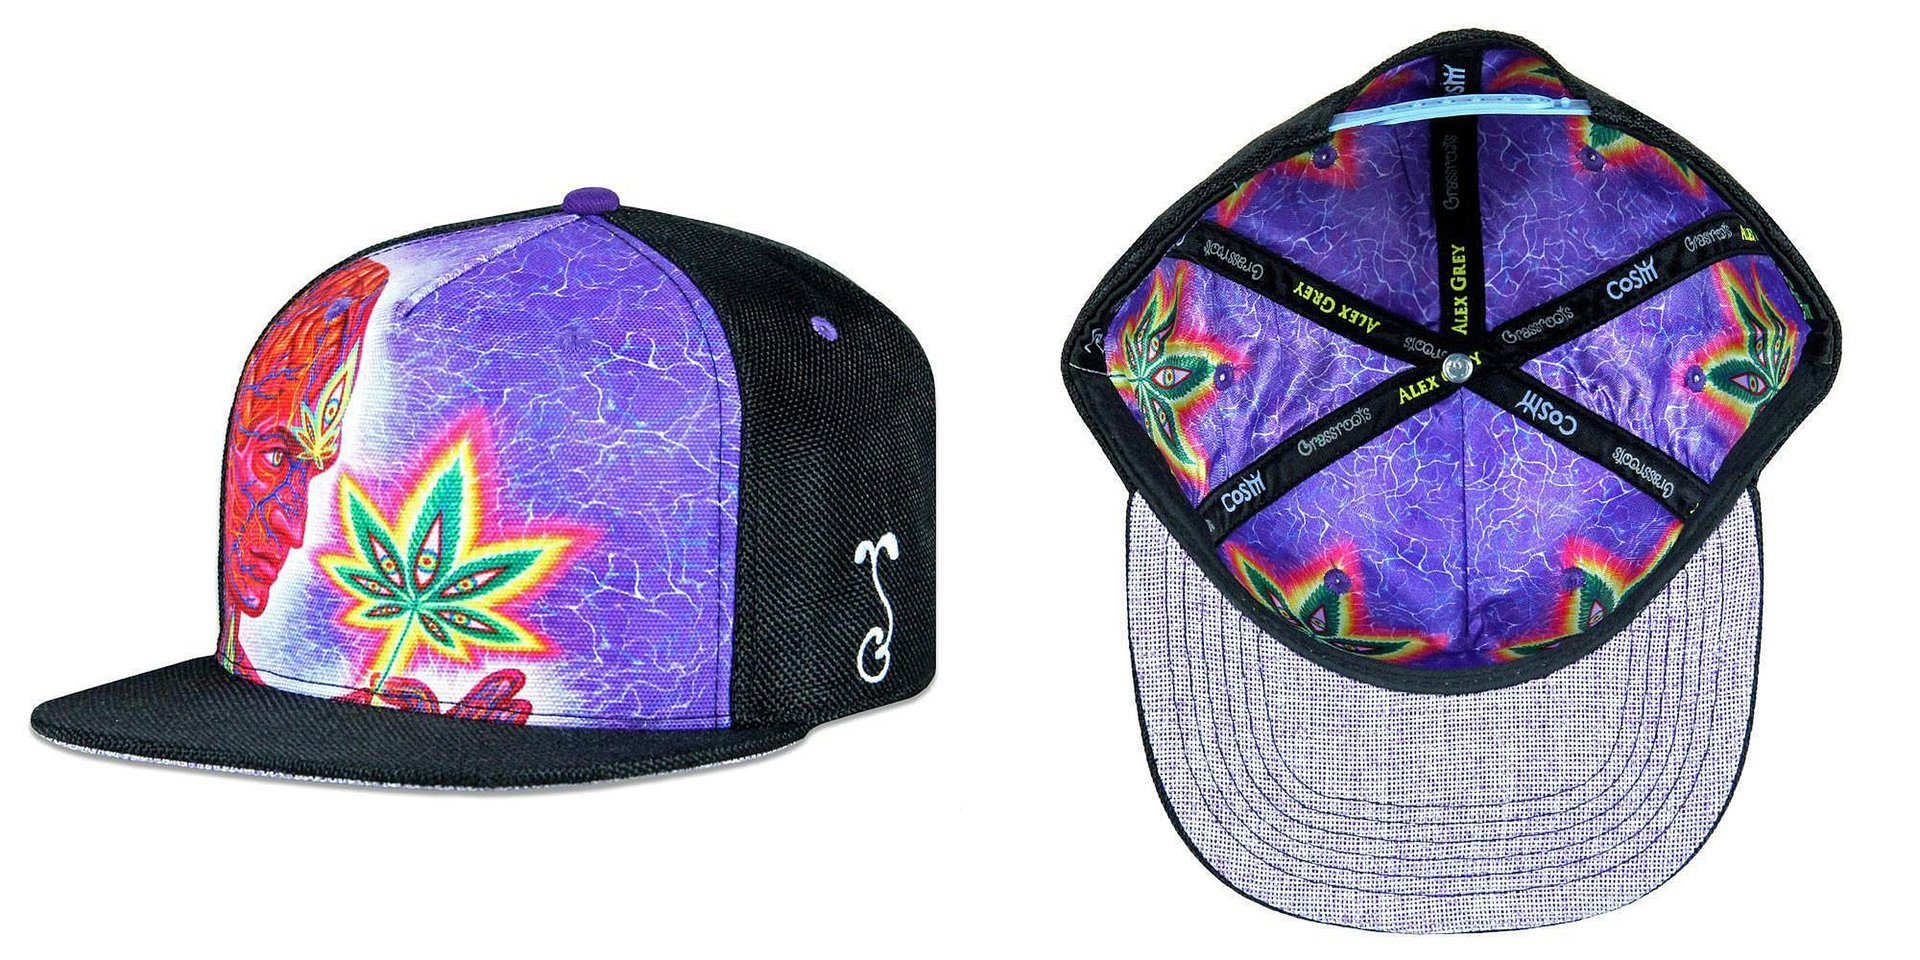 bcd44b49a Snapback Hats | Limited-Edition Hats | La Crosse, WI